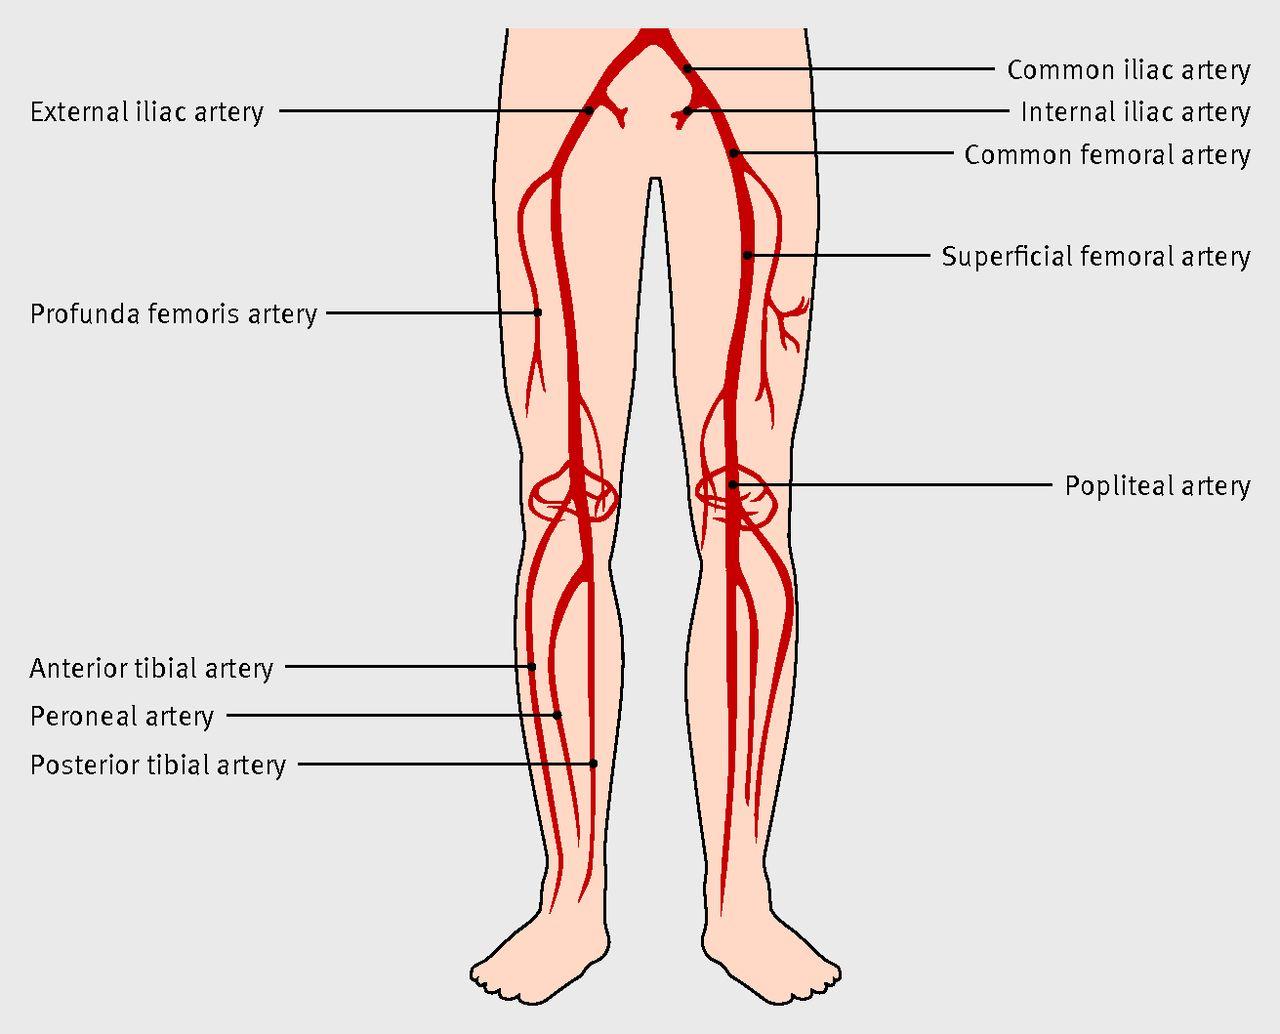 Peripheral Arterial Diagram House Wiring Diagram Symbols